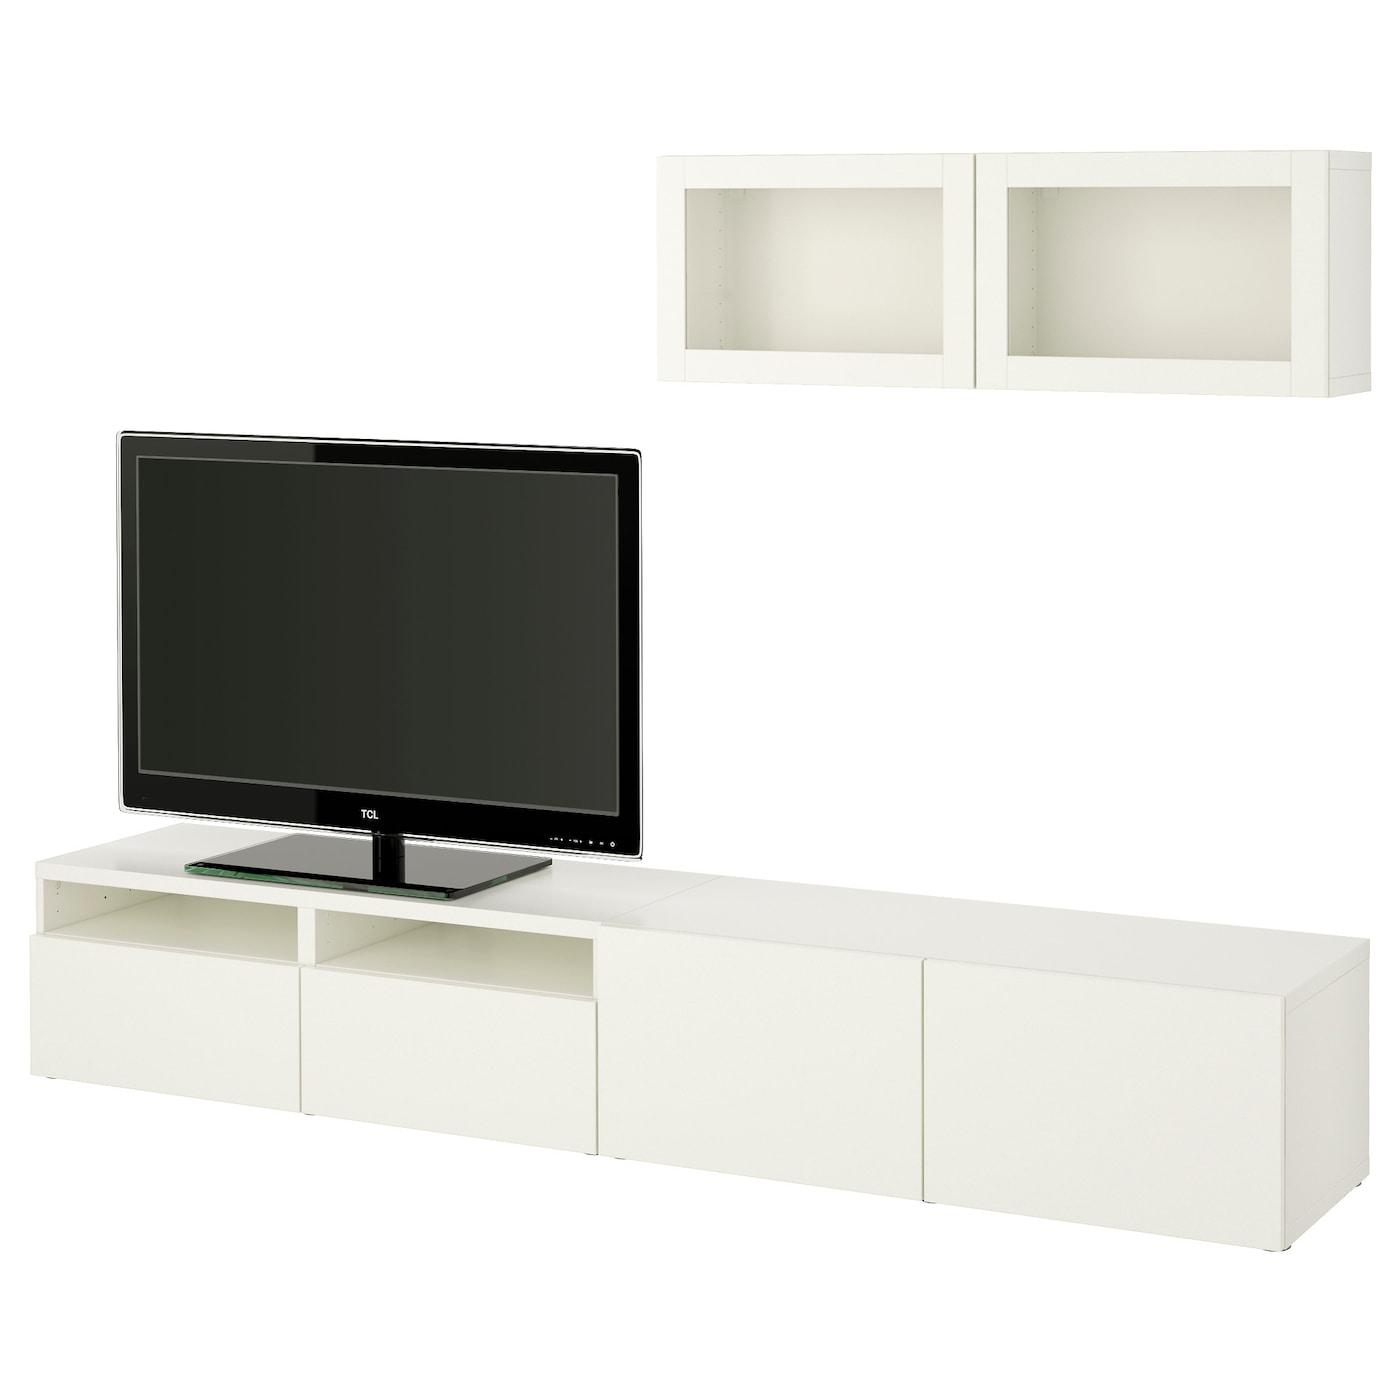 Best tv storage combination glass doors lappviken sindvik - Mueble tele ikea ...